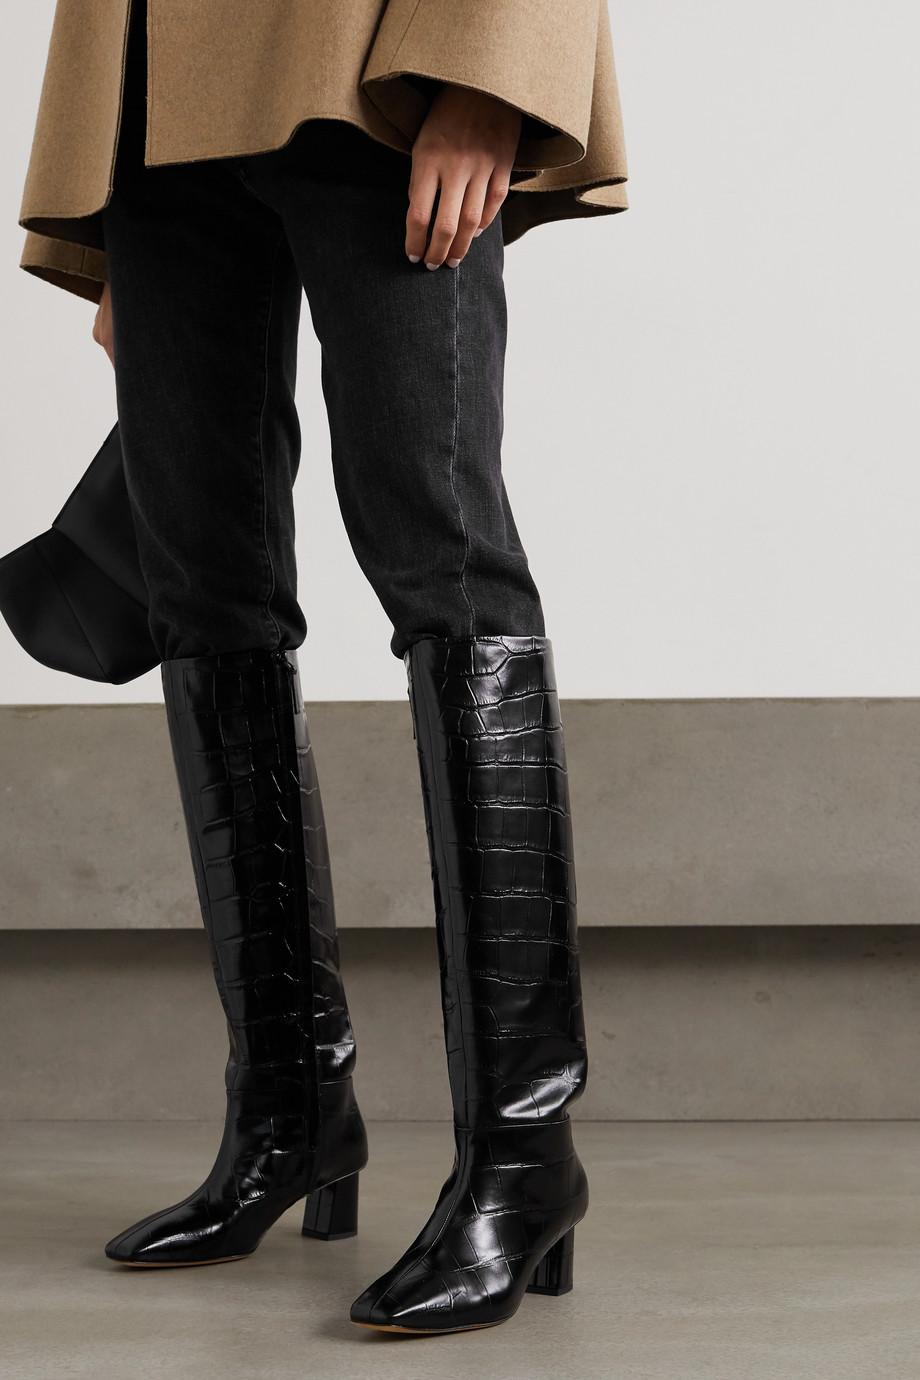 3.1 Phillip Lim Tess kniehohe Stiefel aus Leder mit Krokodileffekt